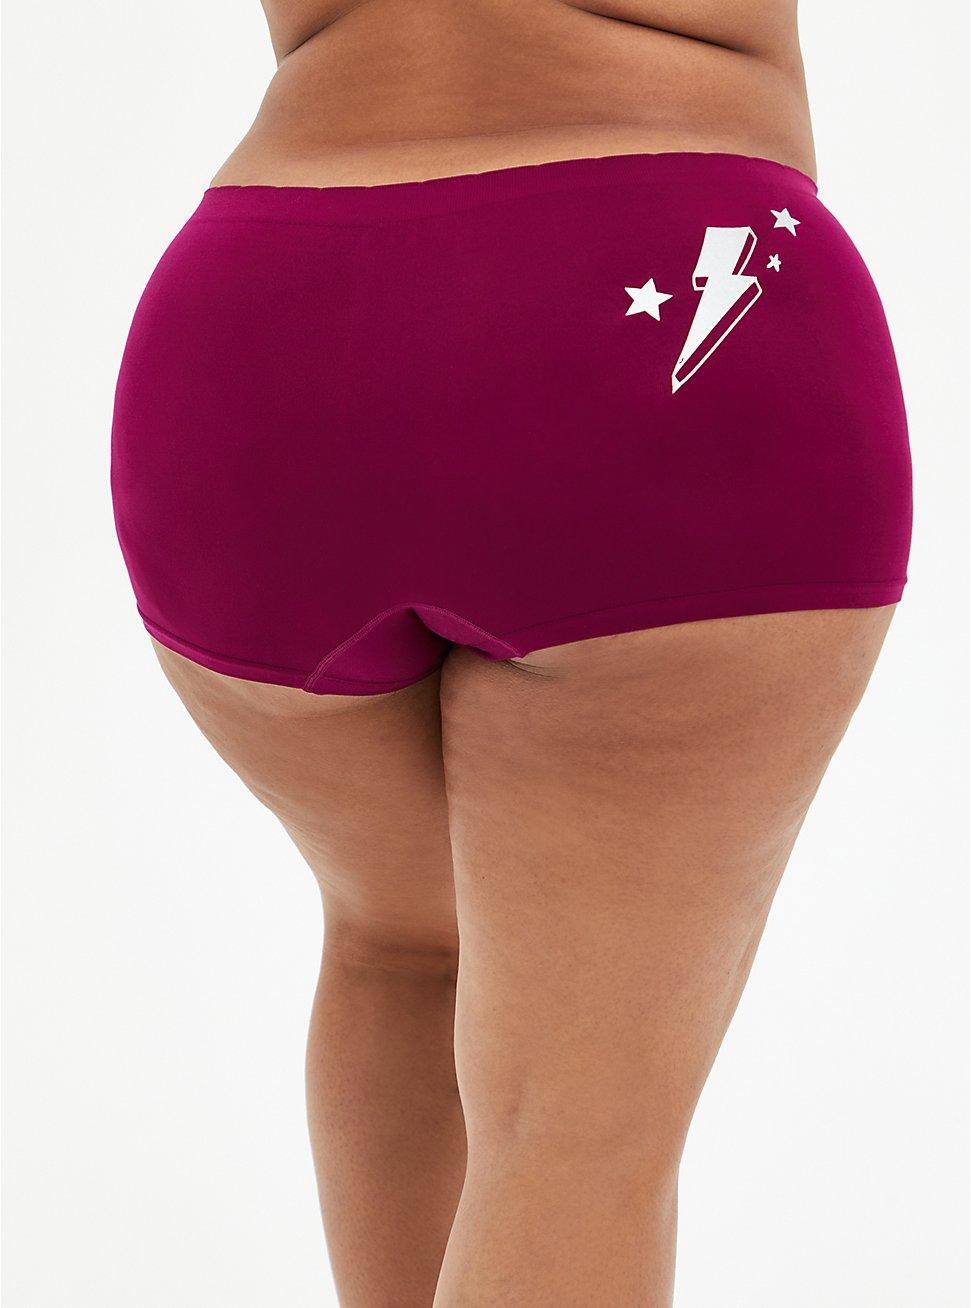 Berry Pink Doodle Heart Seamless Boyshort Panty, , hi-res